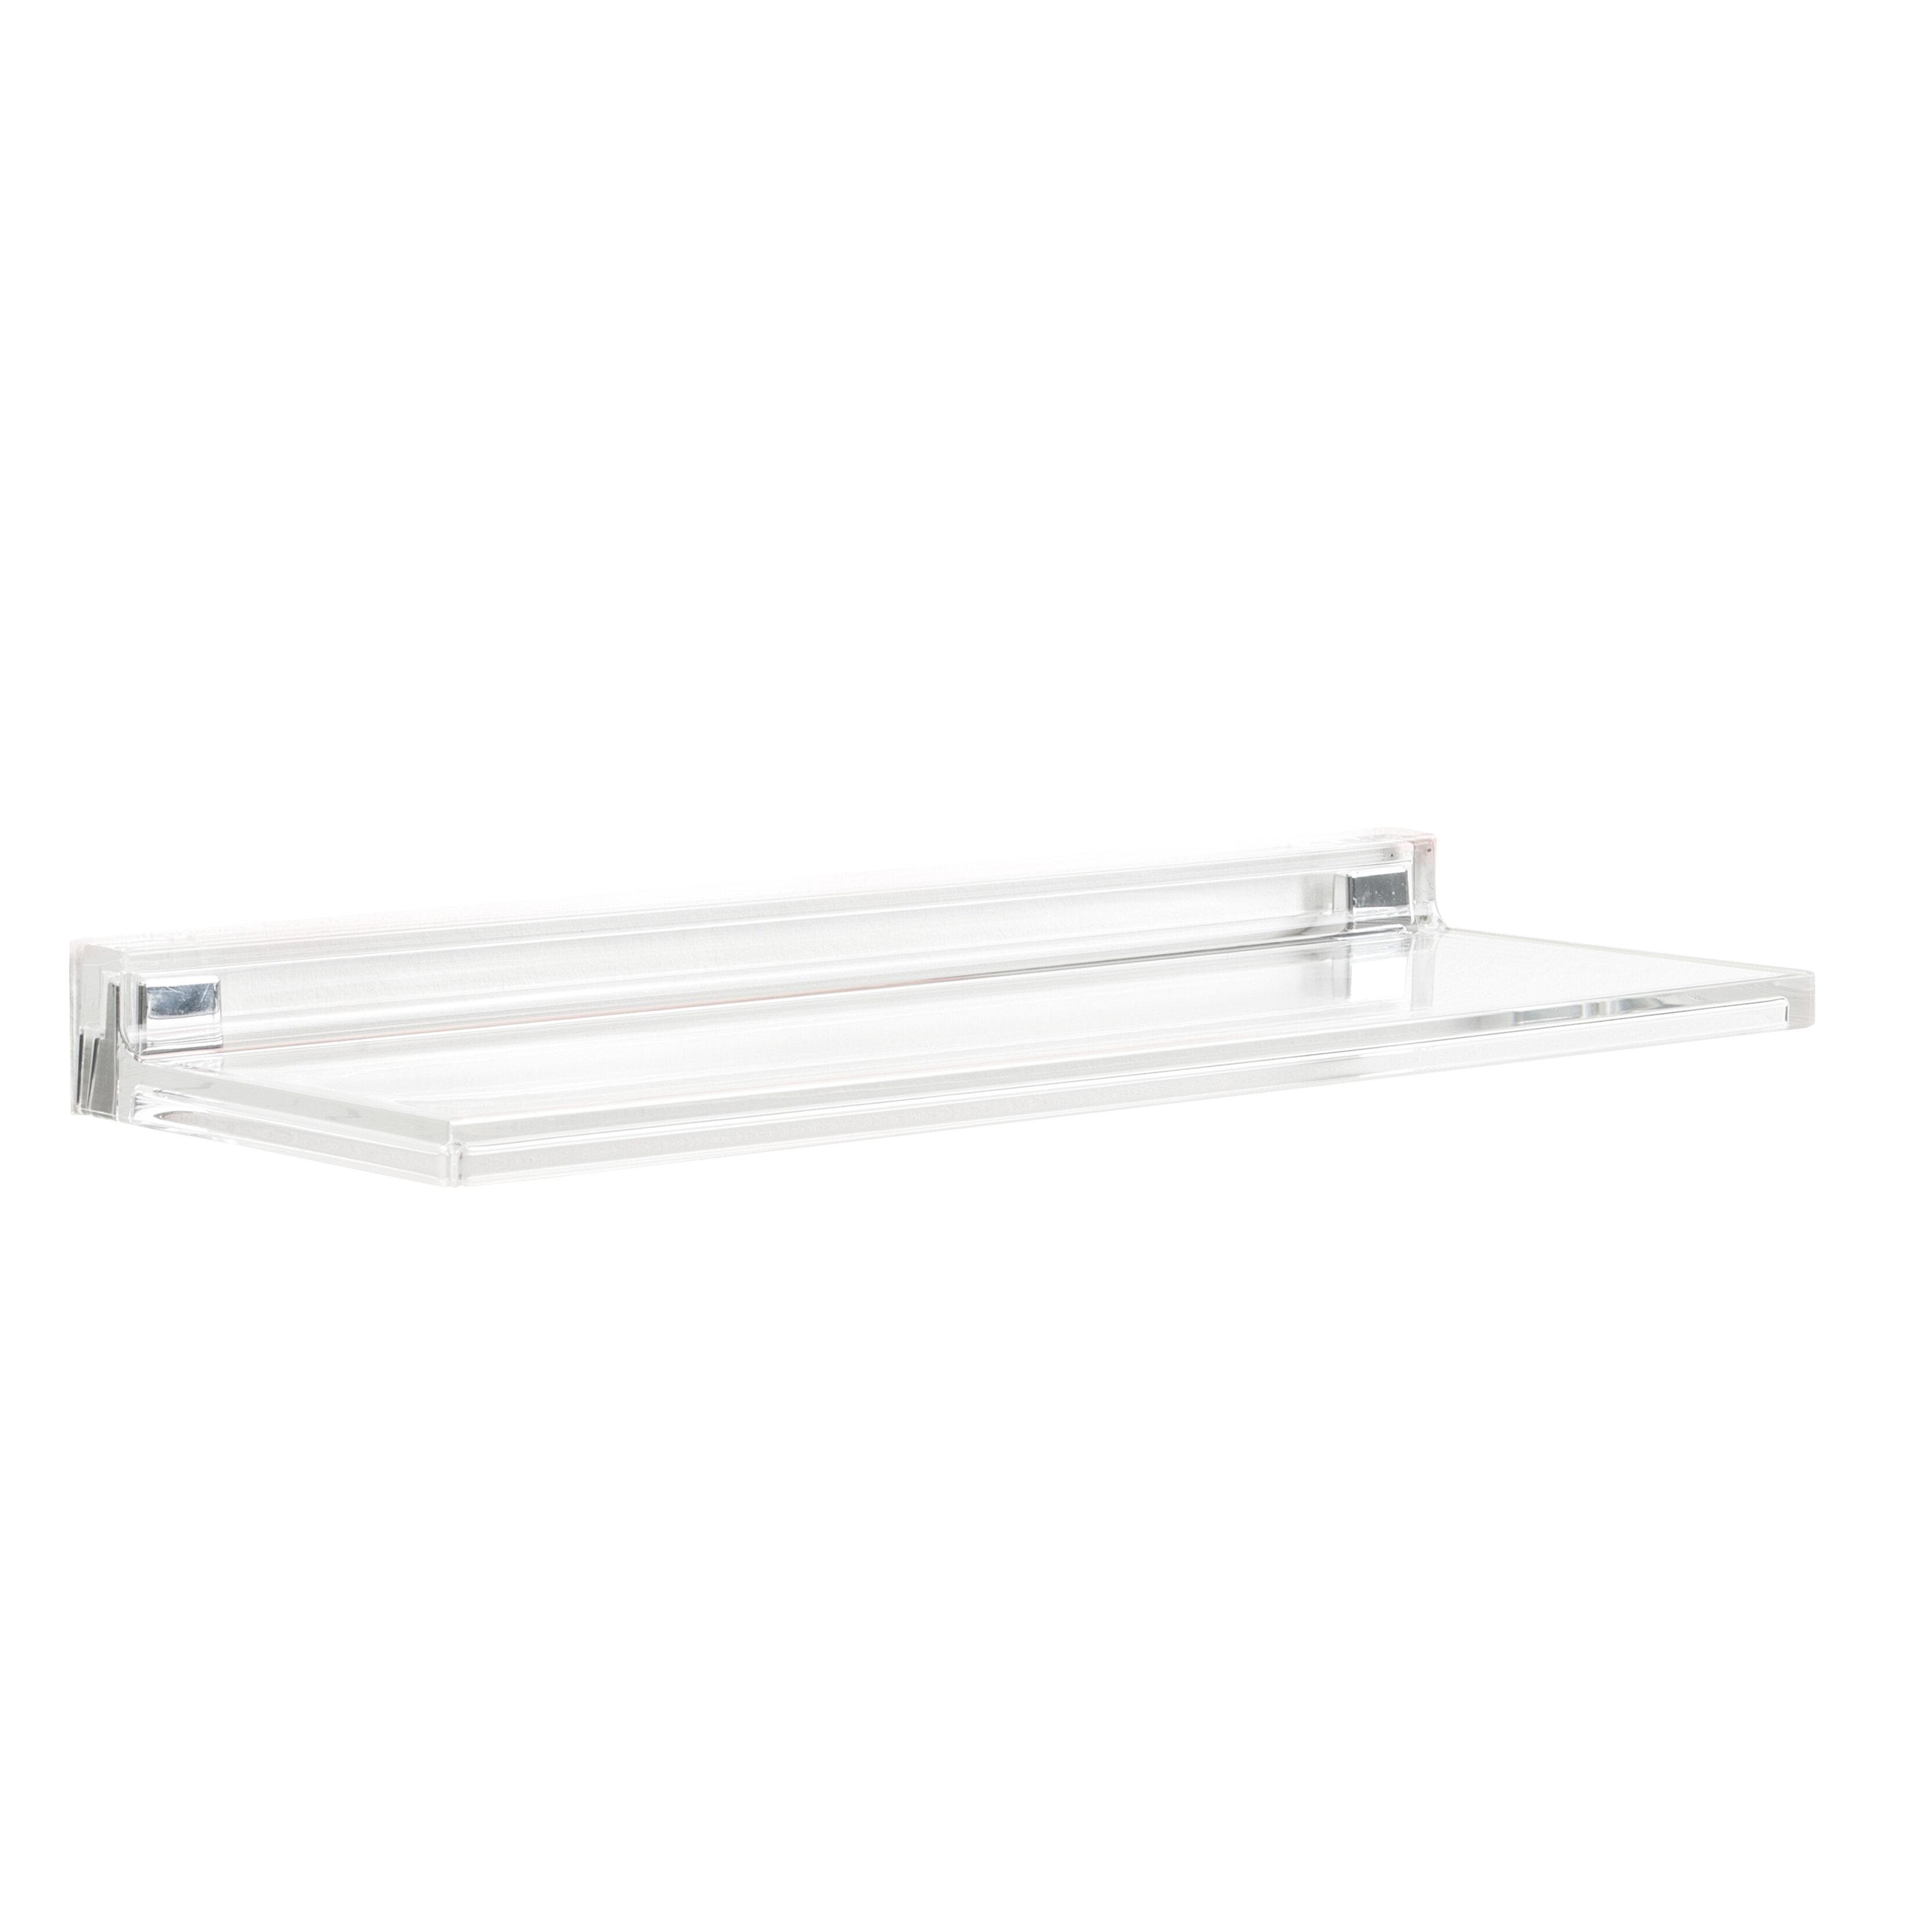 Kartell Floating Shelf With Adjustable Shelves Reviews Wayfair